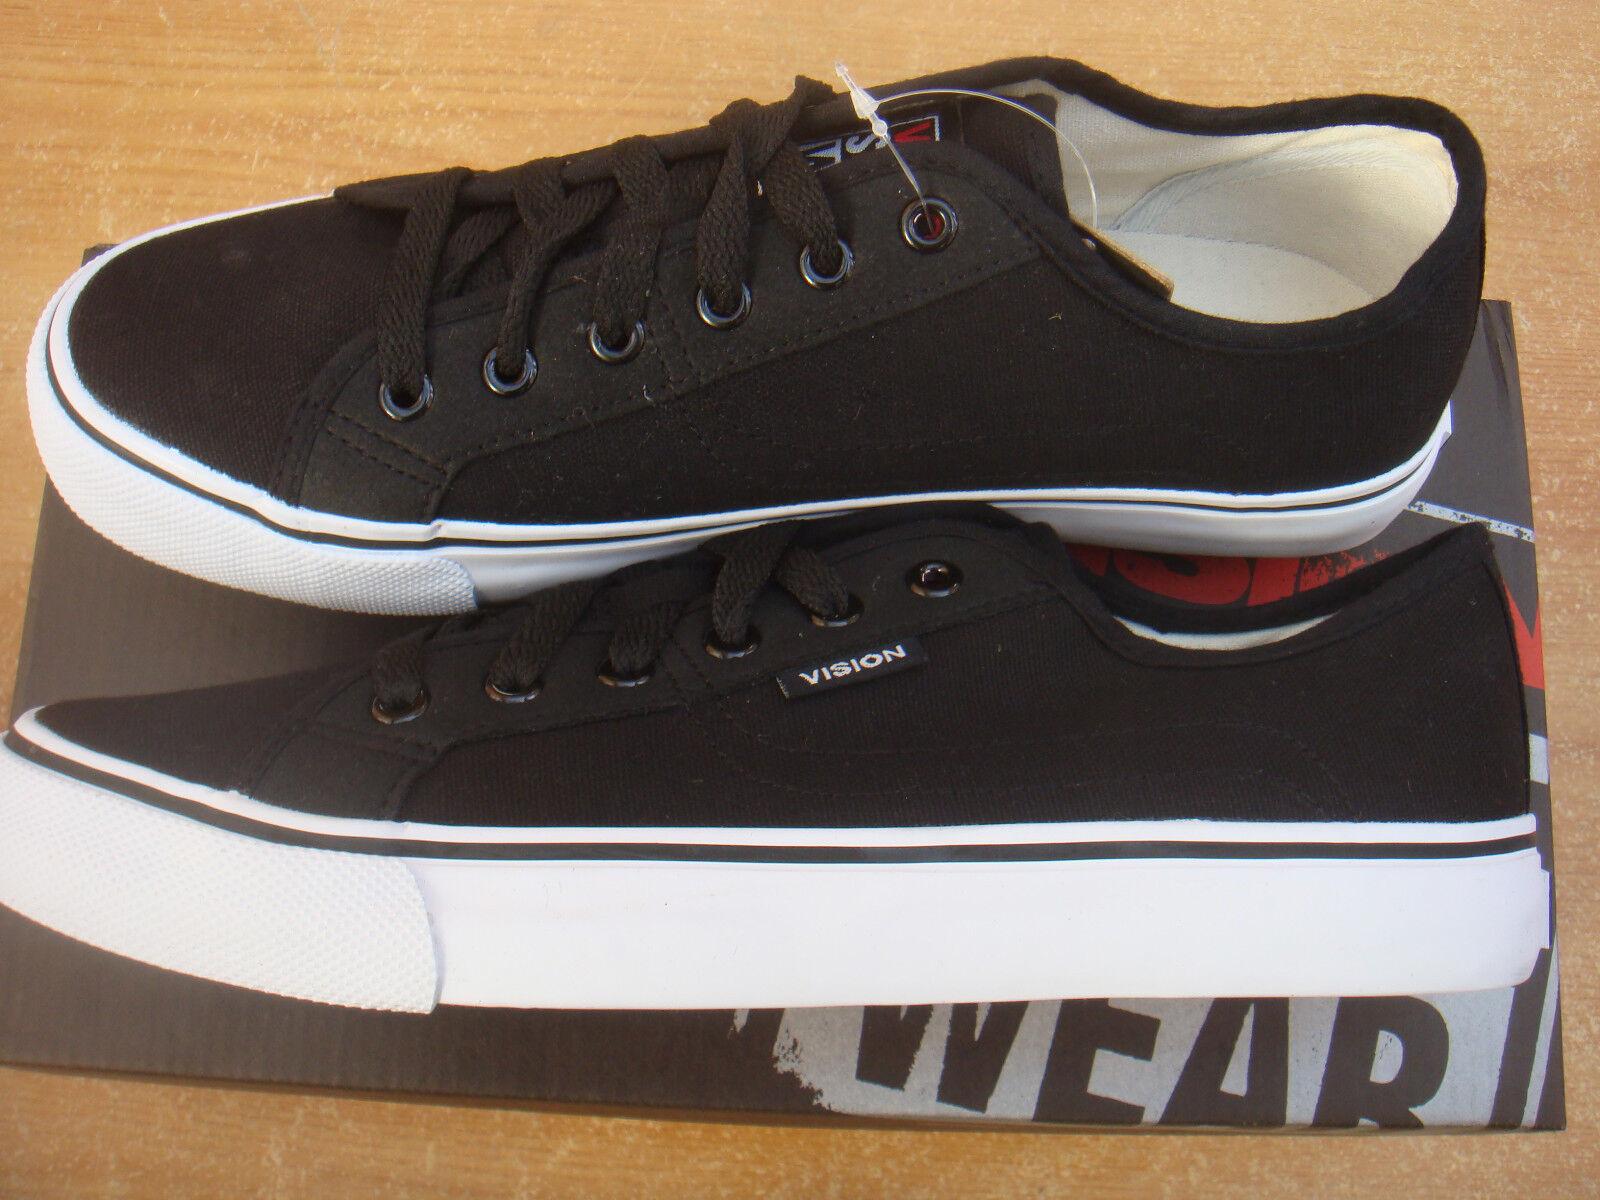 Skateboard noir/blanc VISION STREET wear toile baskets taille uk 10